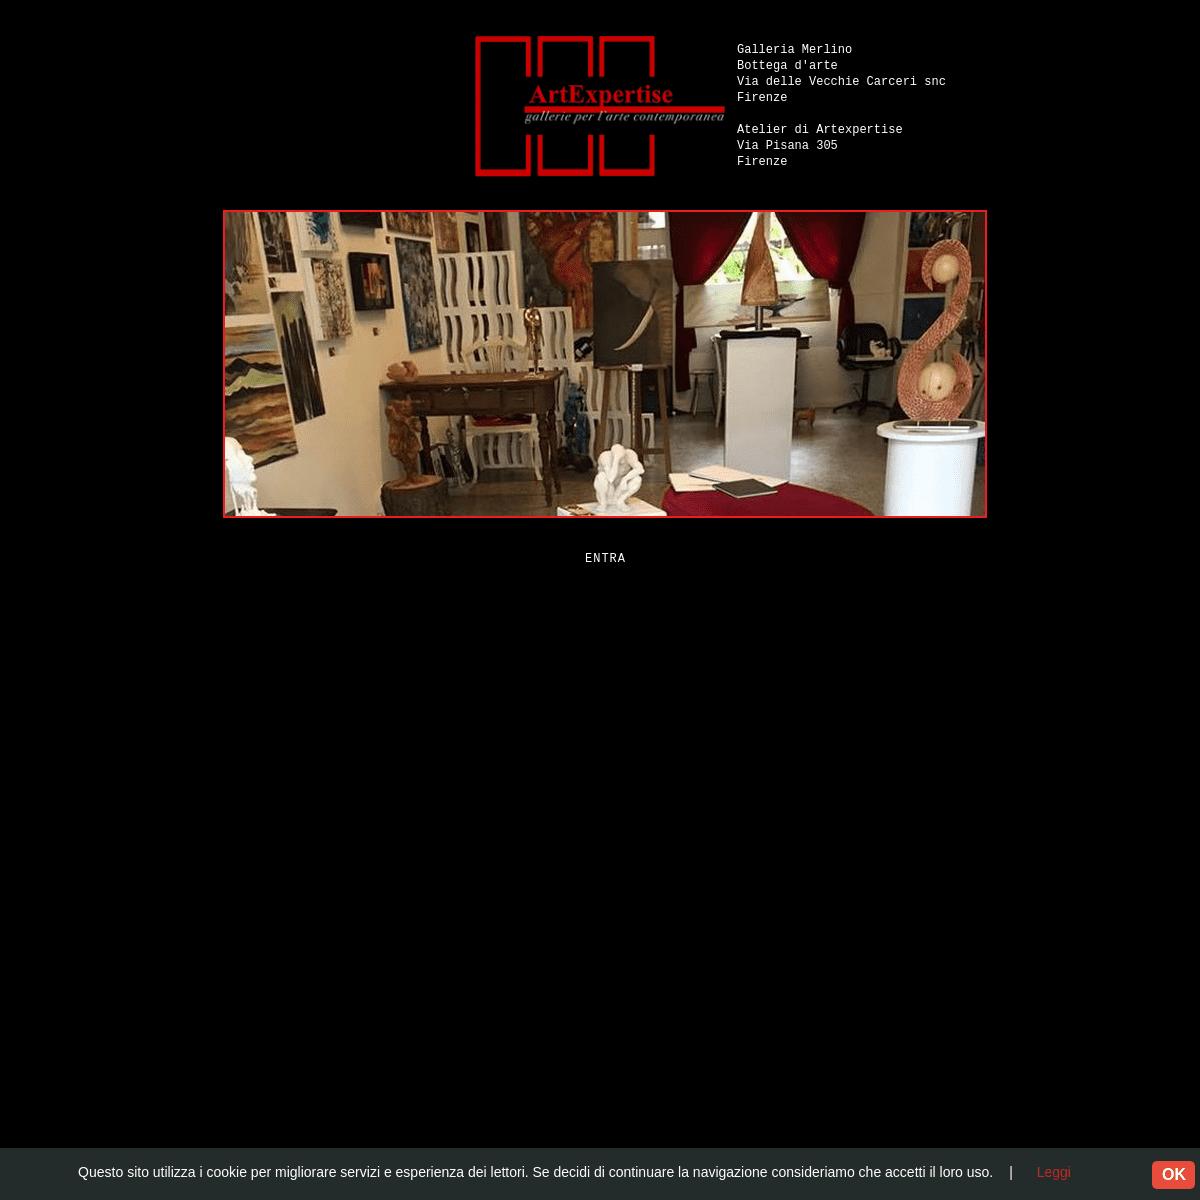 Merlino Bottega D Arte intro artexpertise-firenze (citation archivebay)